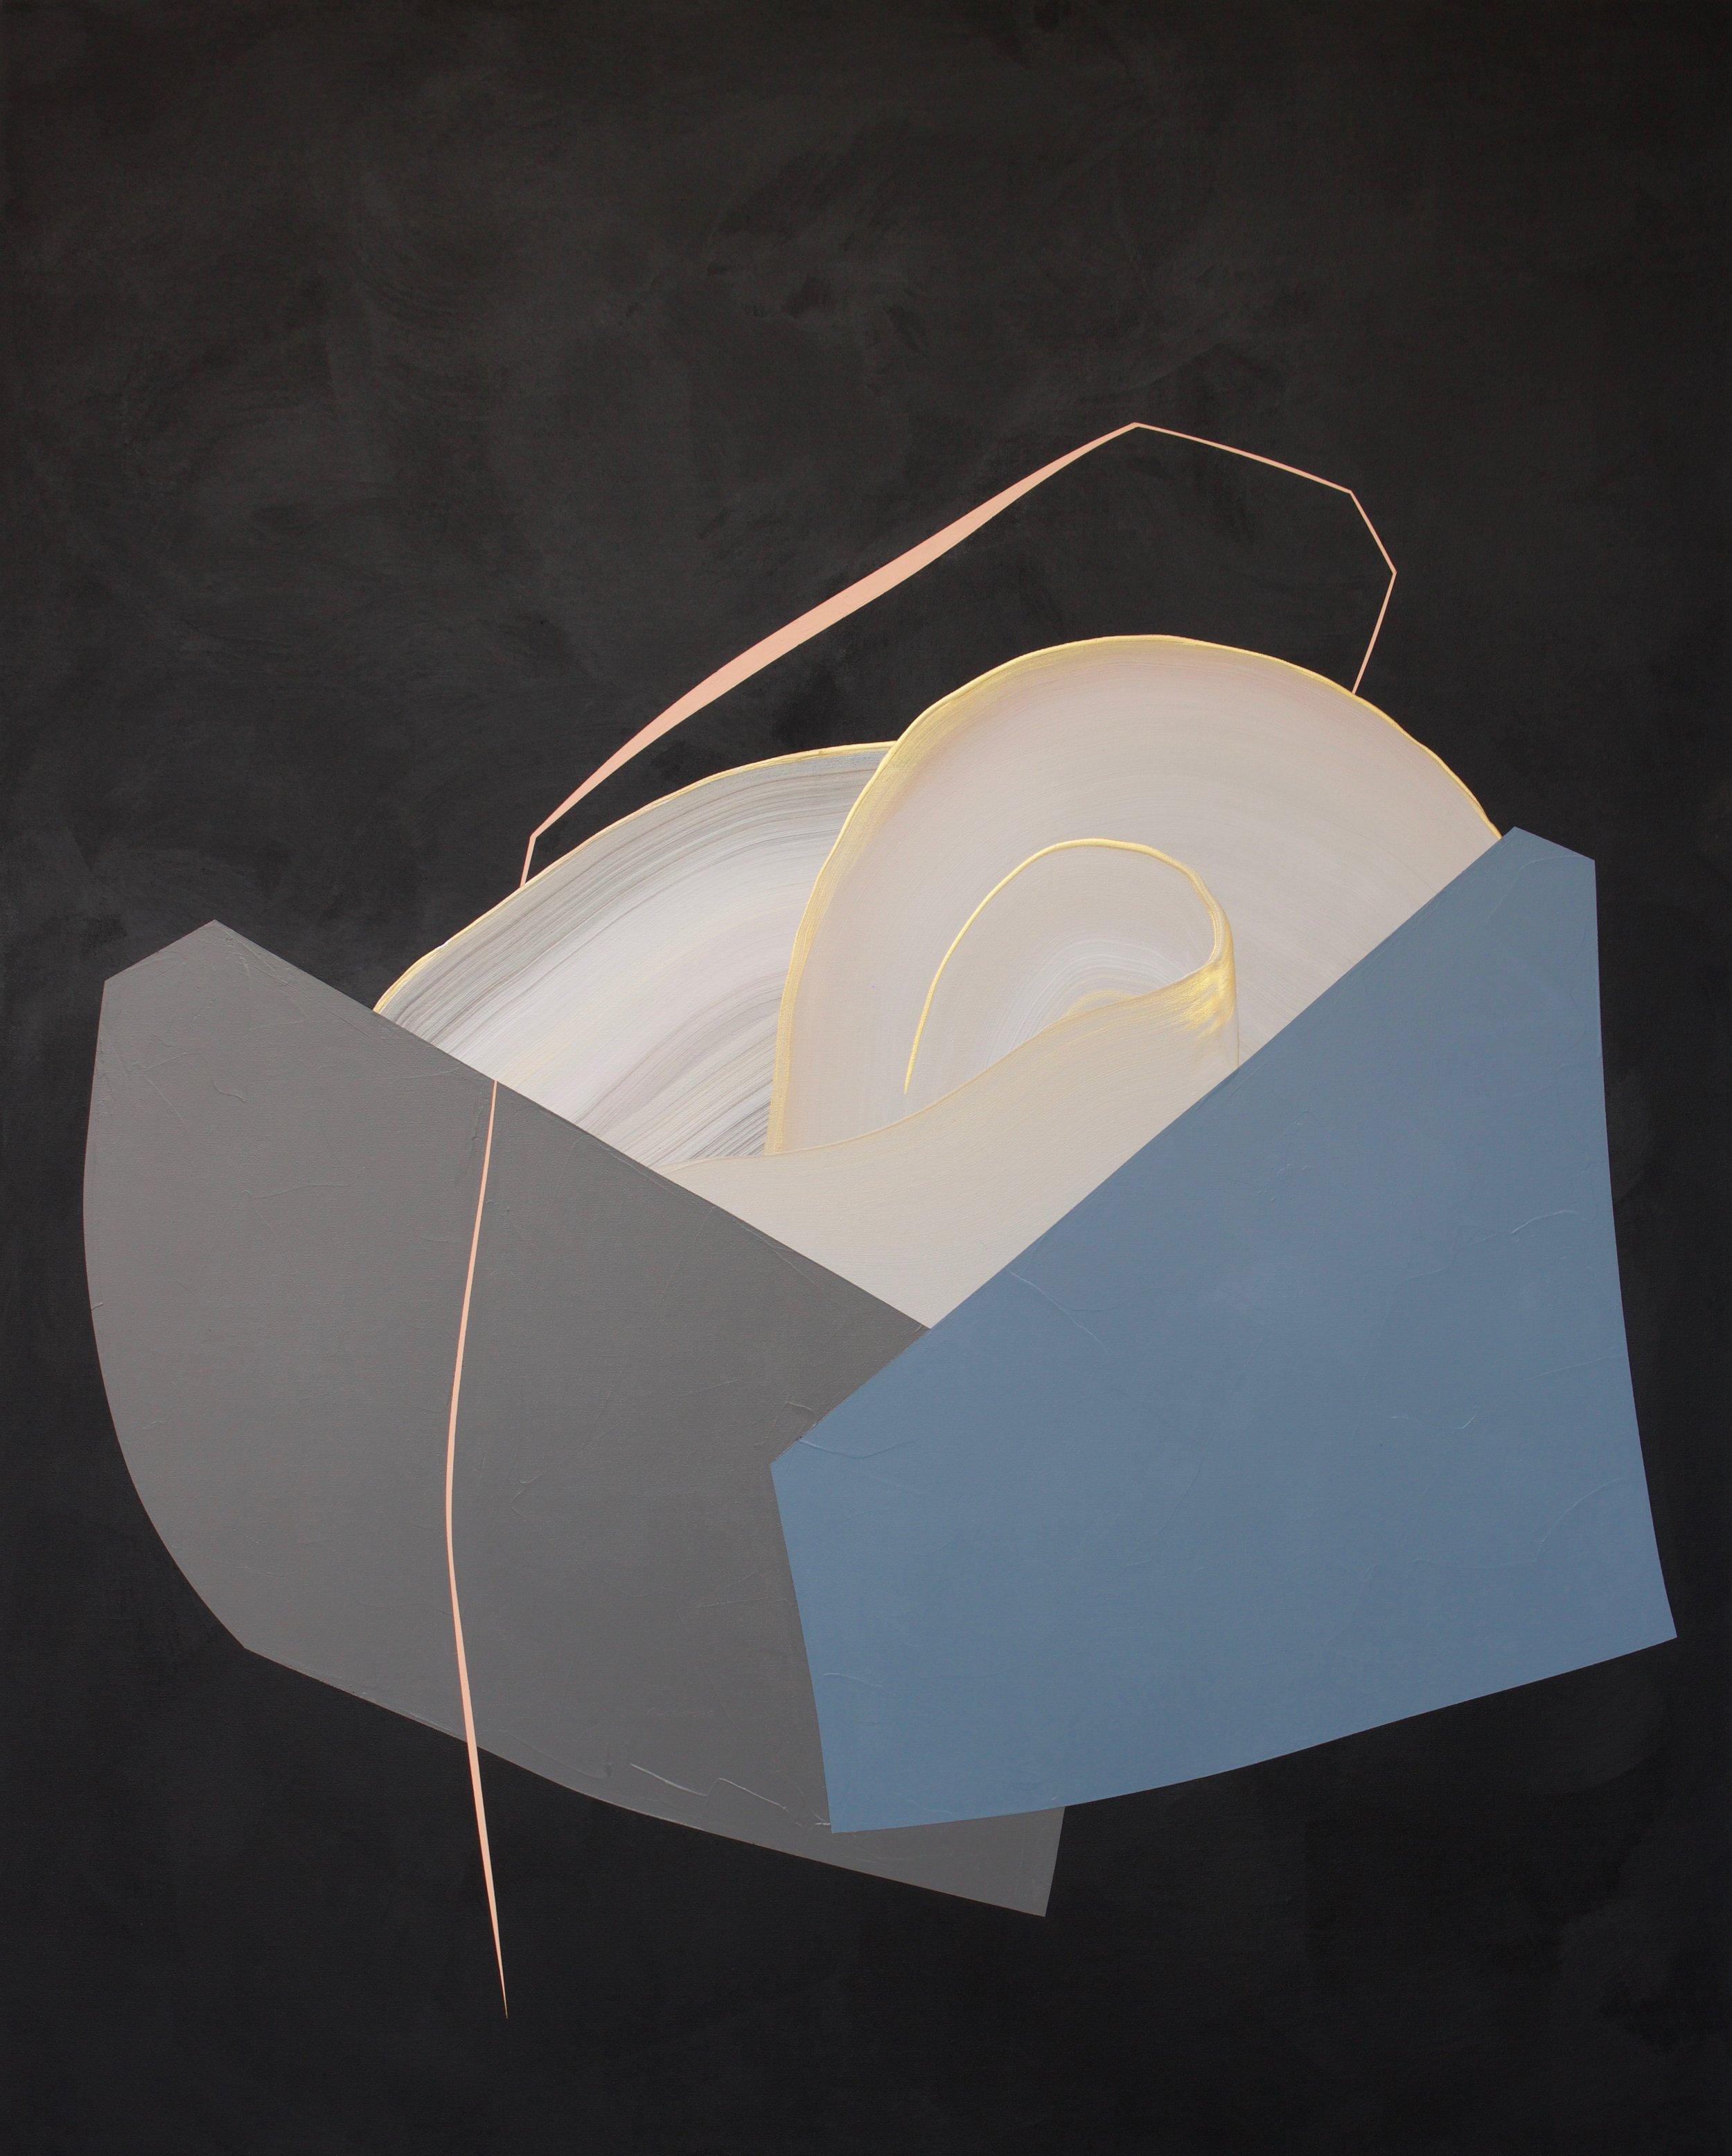 Feeling Good Mixed acrylic medium on canvas 48x60 inches $2350.00